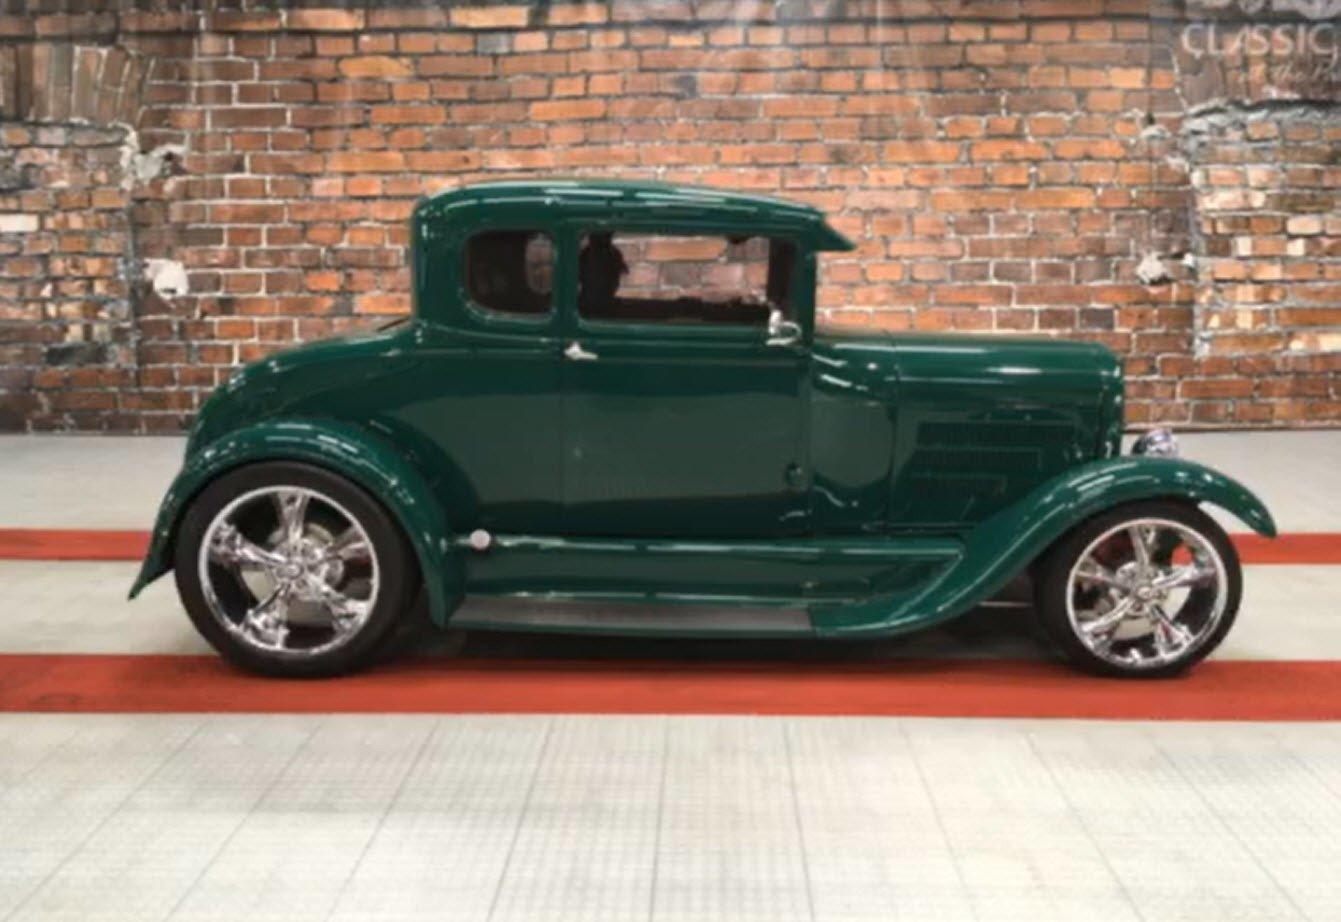 1929 ford model a street rod replica